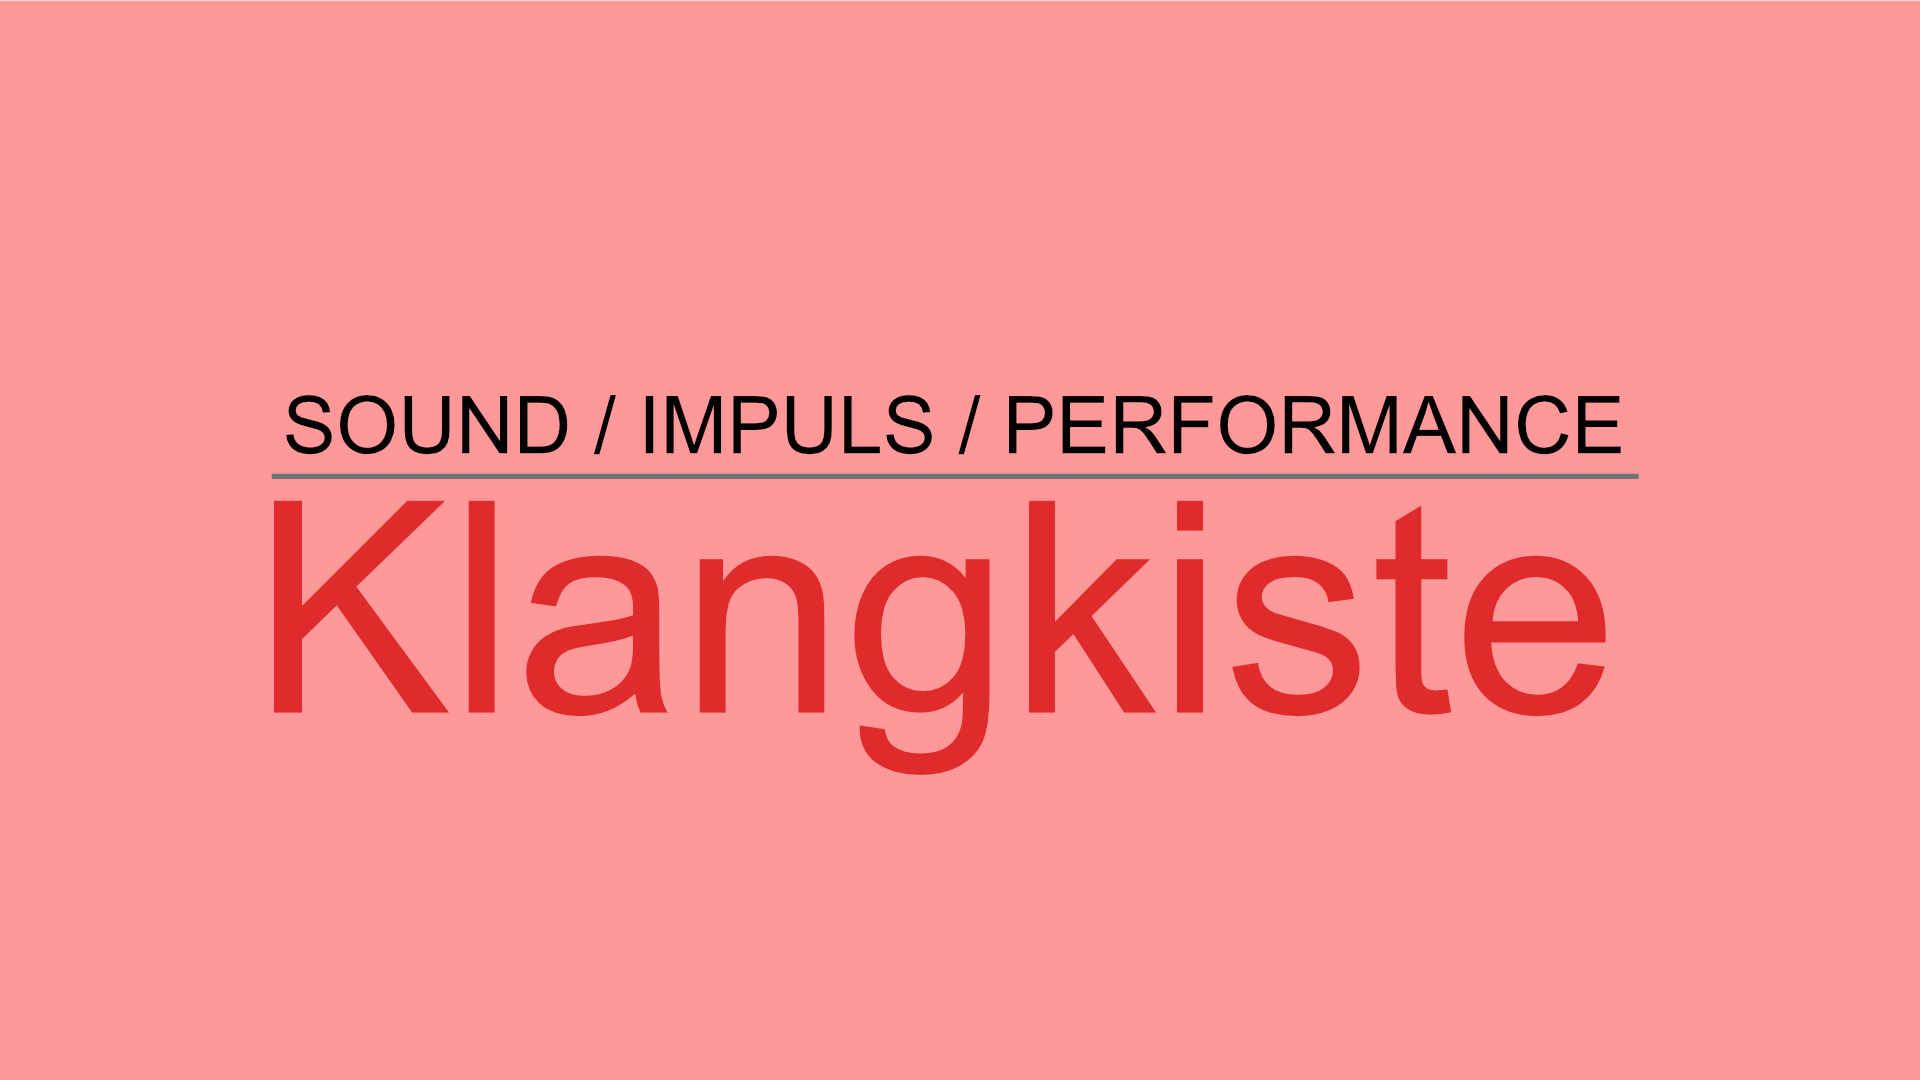 klangkiste7